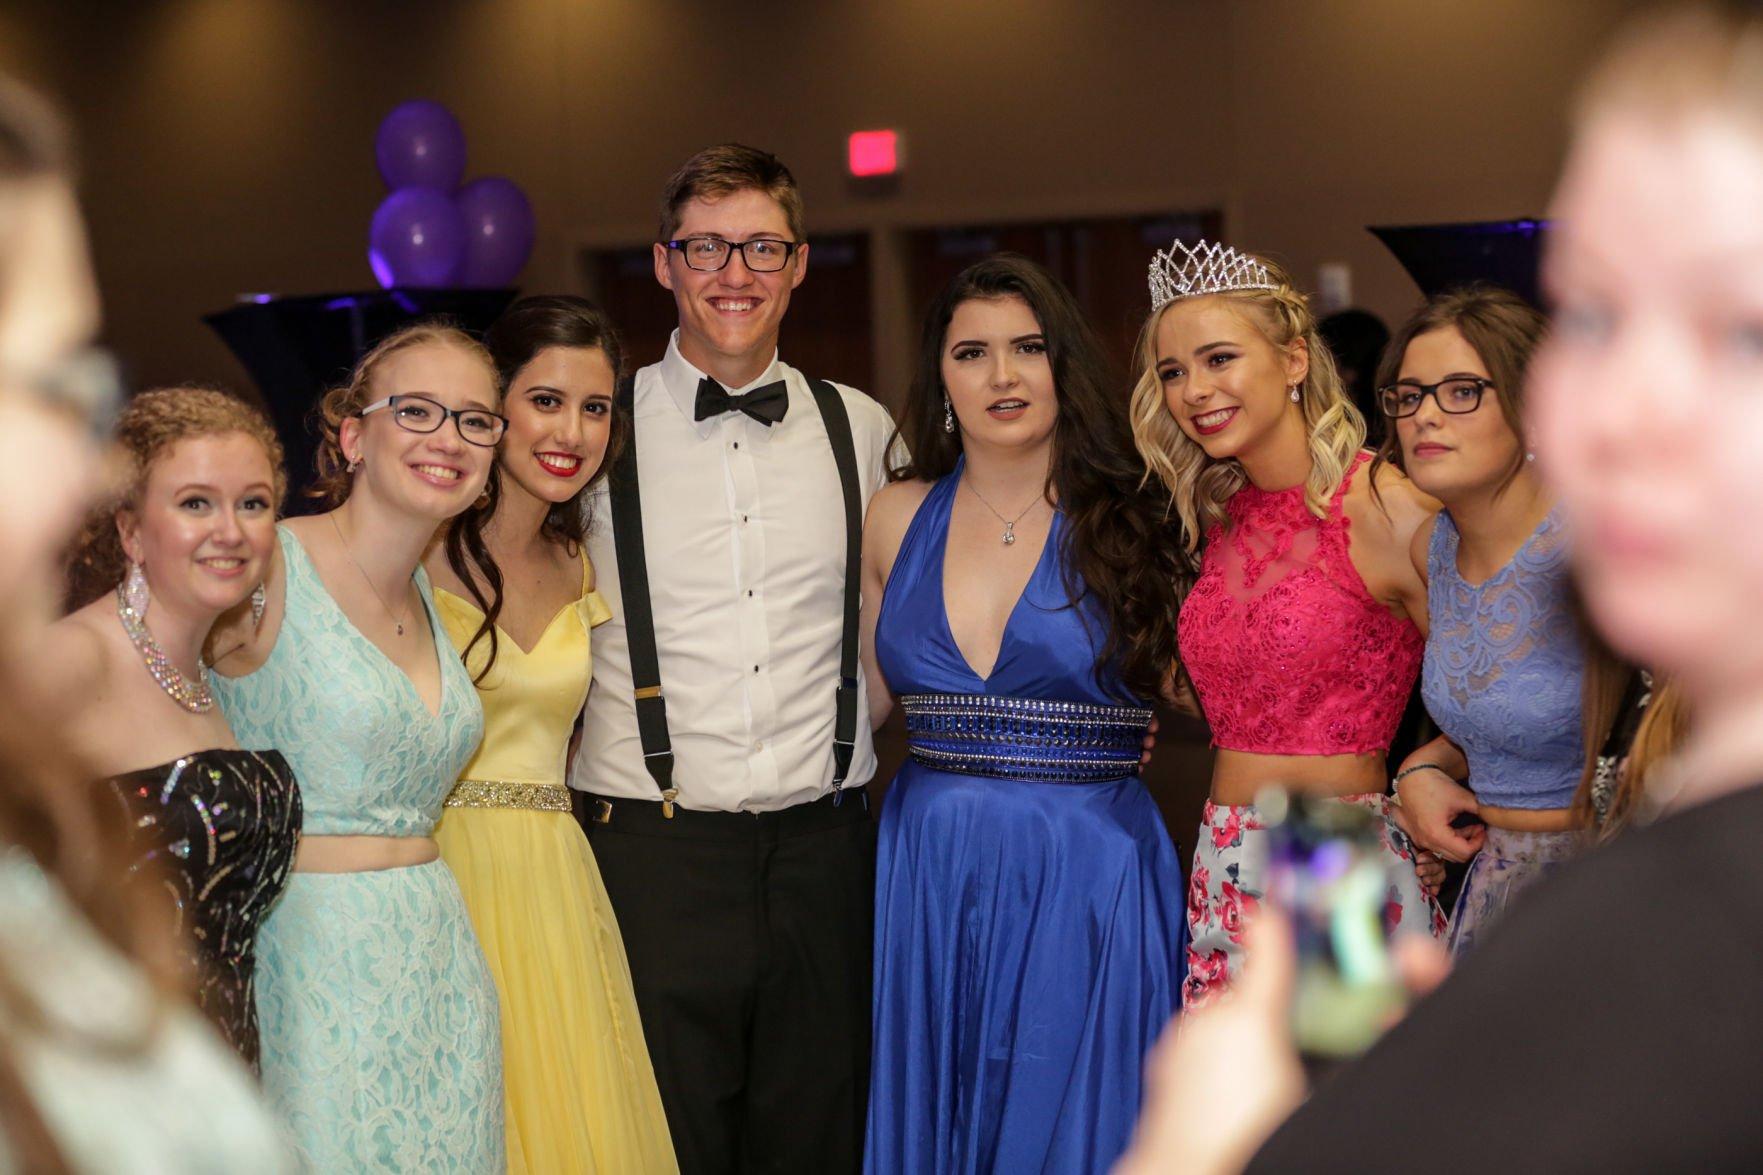 20170416 GlenpoolProm TulsaWorld 091 Photo Gallery Glenpool High School prom